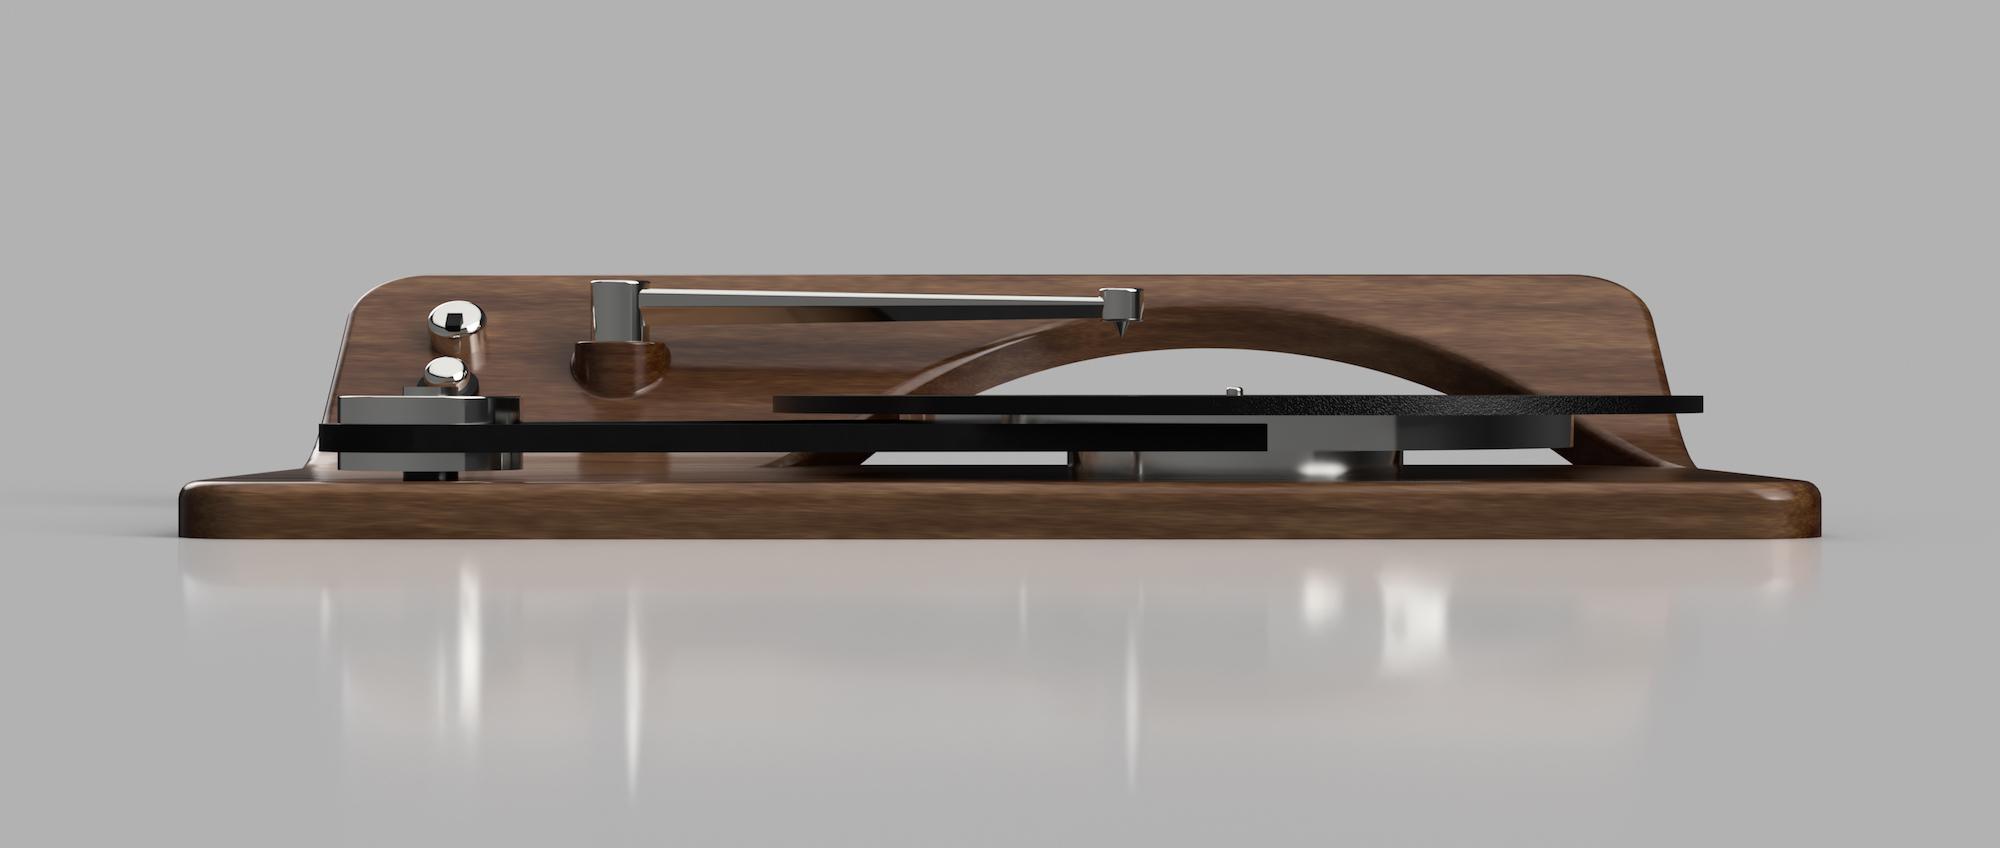 Brennan-Chiu_Industrial-Design_CAD-Renders_Record-Player3.jpg